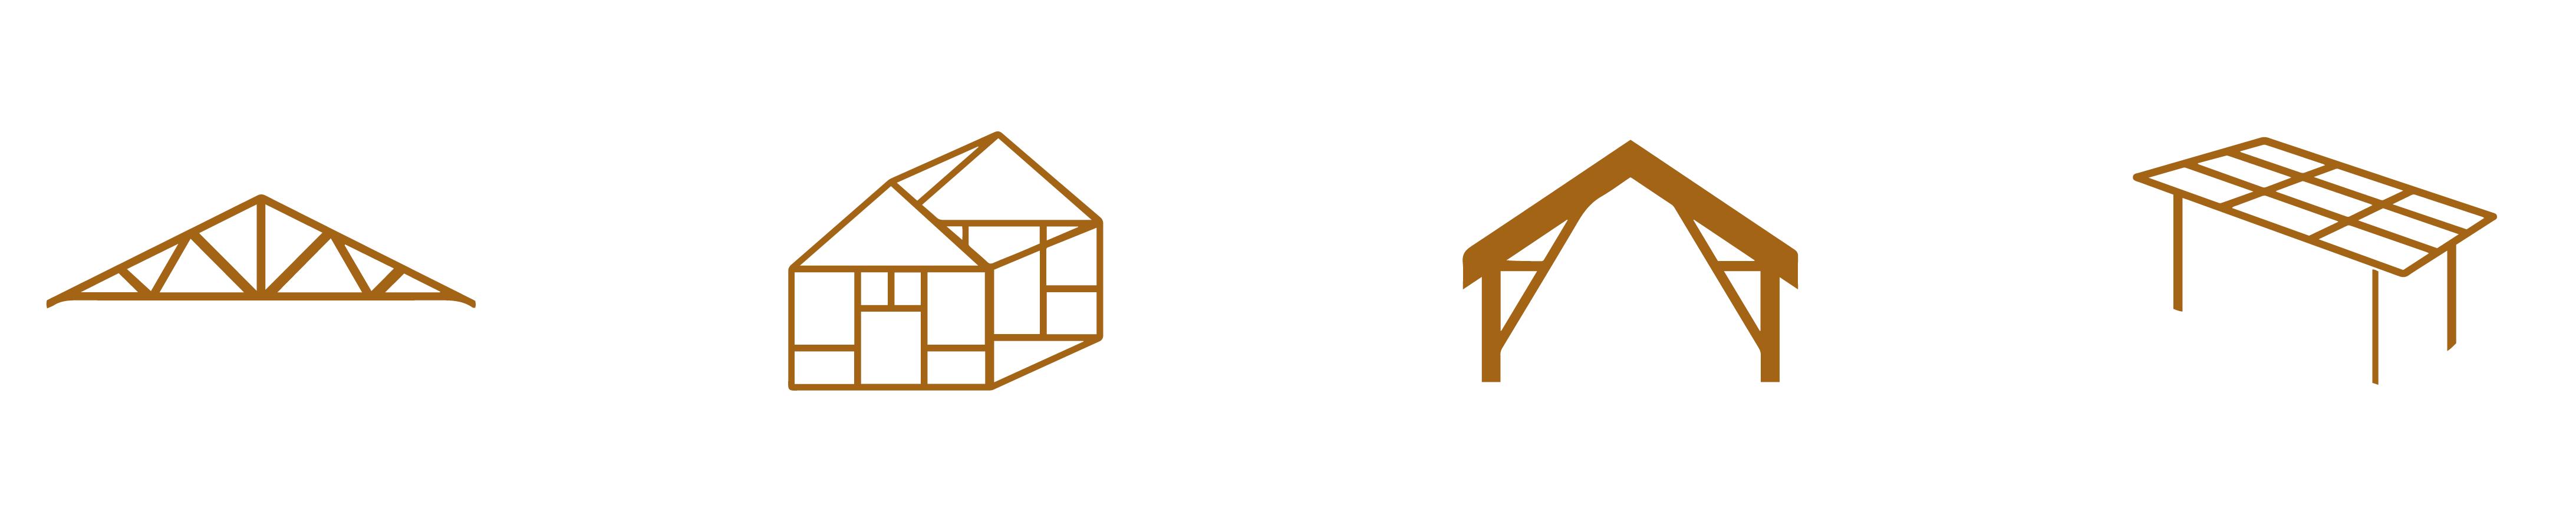 prestations-ossature-bois-charpente-morin-construction-bois